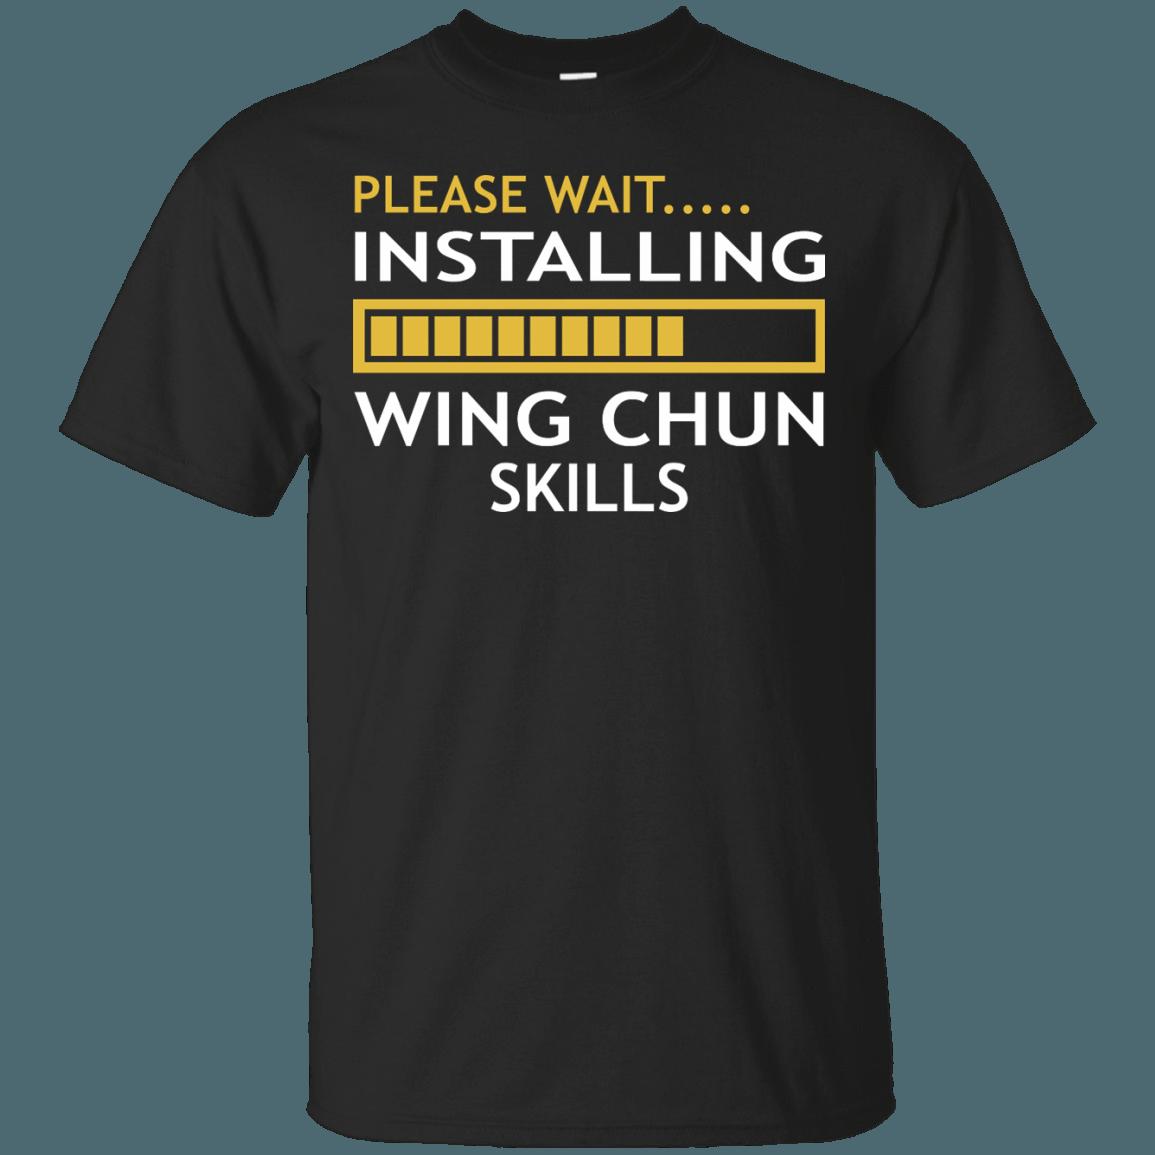 Installing Wing Chun Skills T shirt, Farter, Cool t shirts